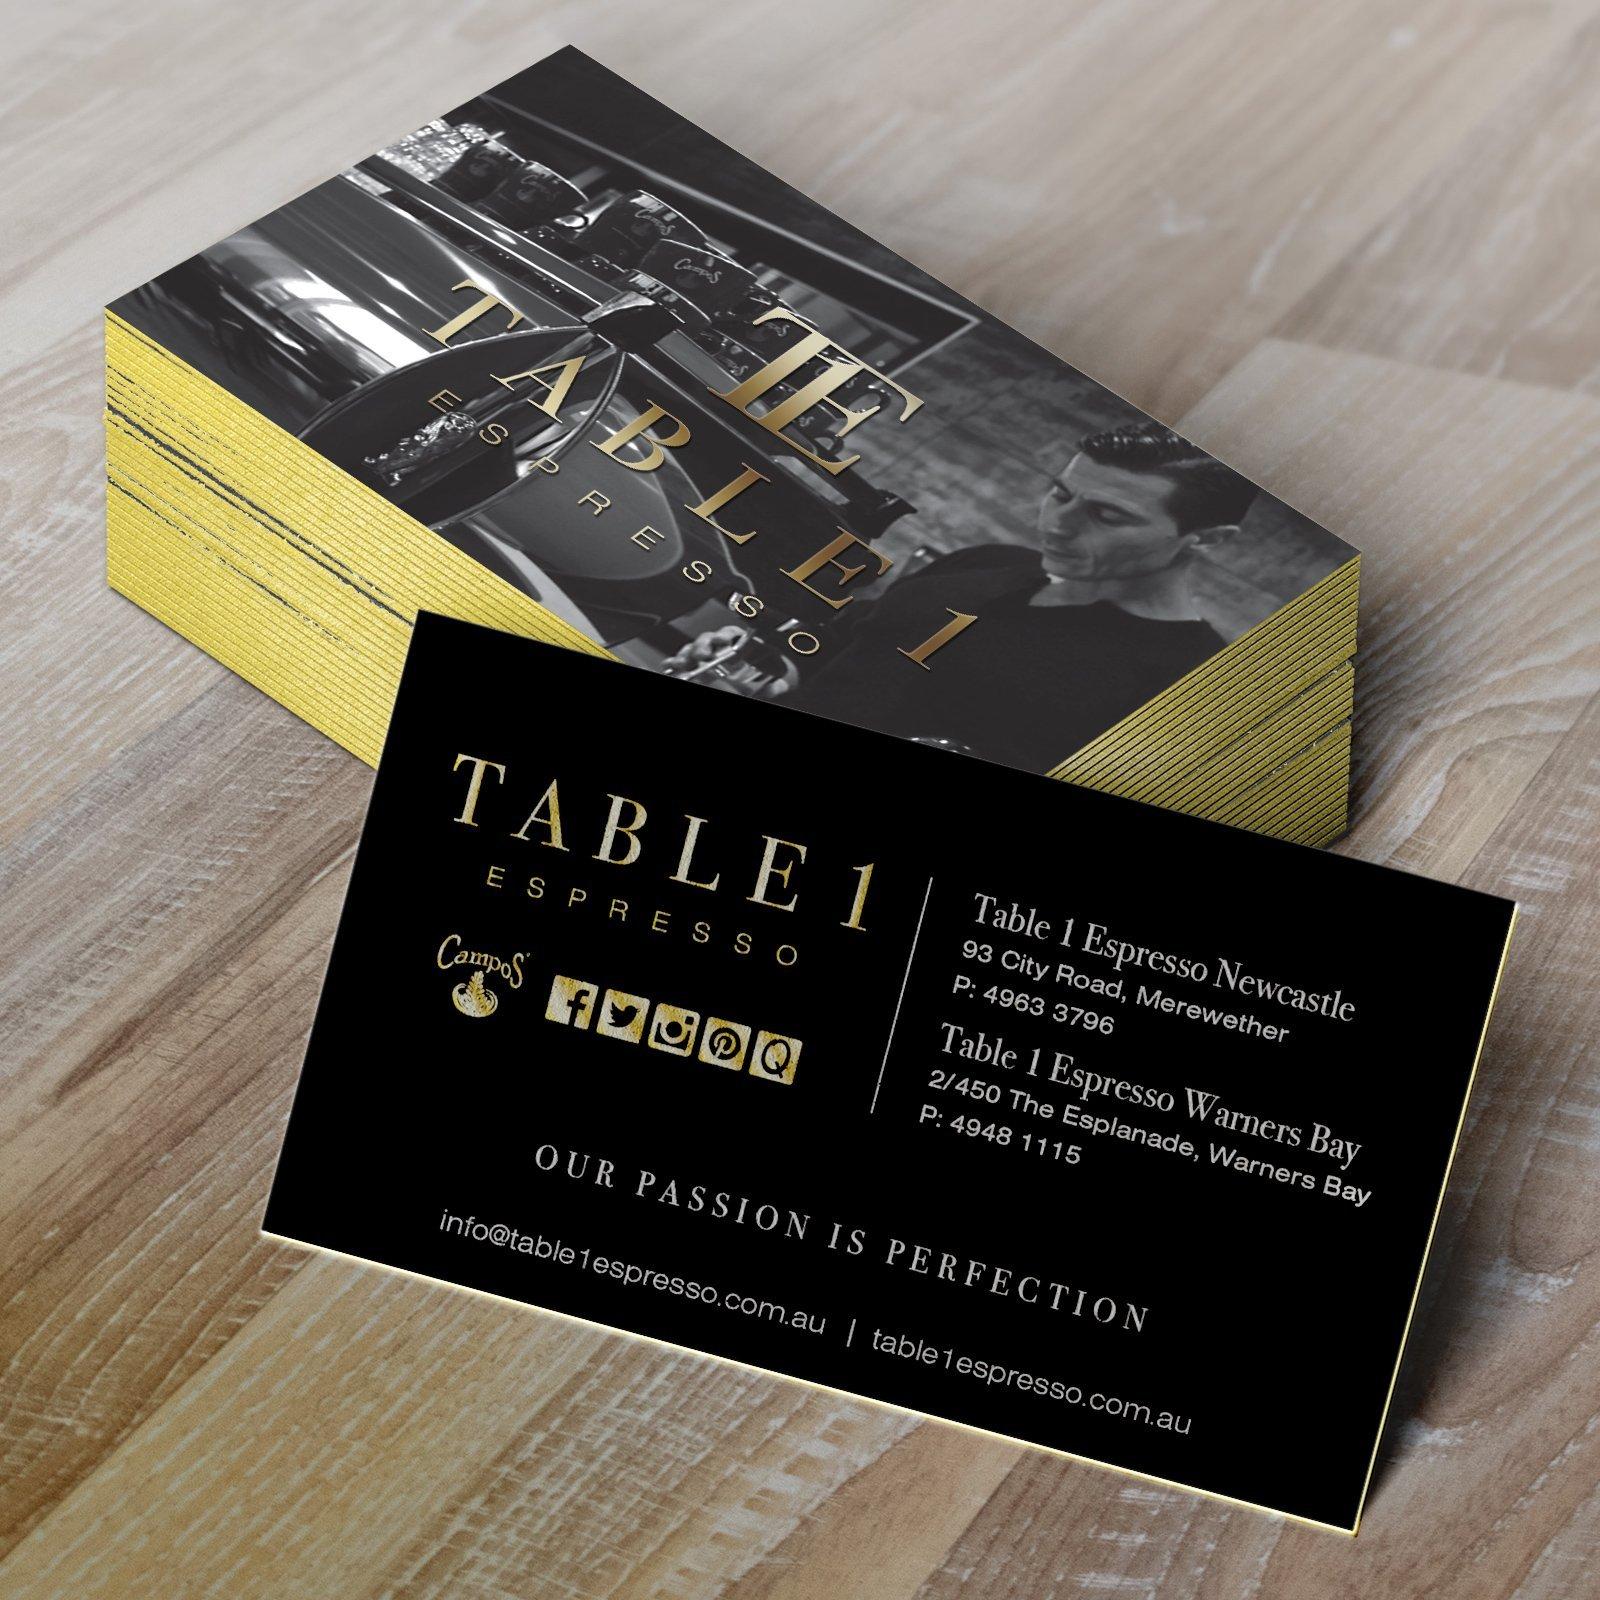 Table 1 Espresso Business Card